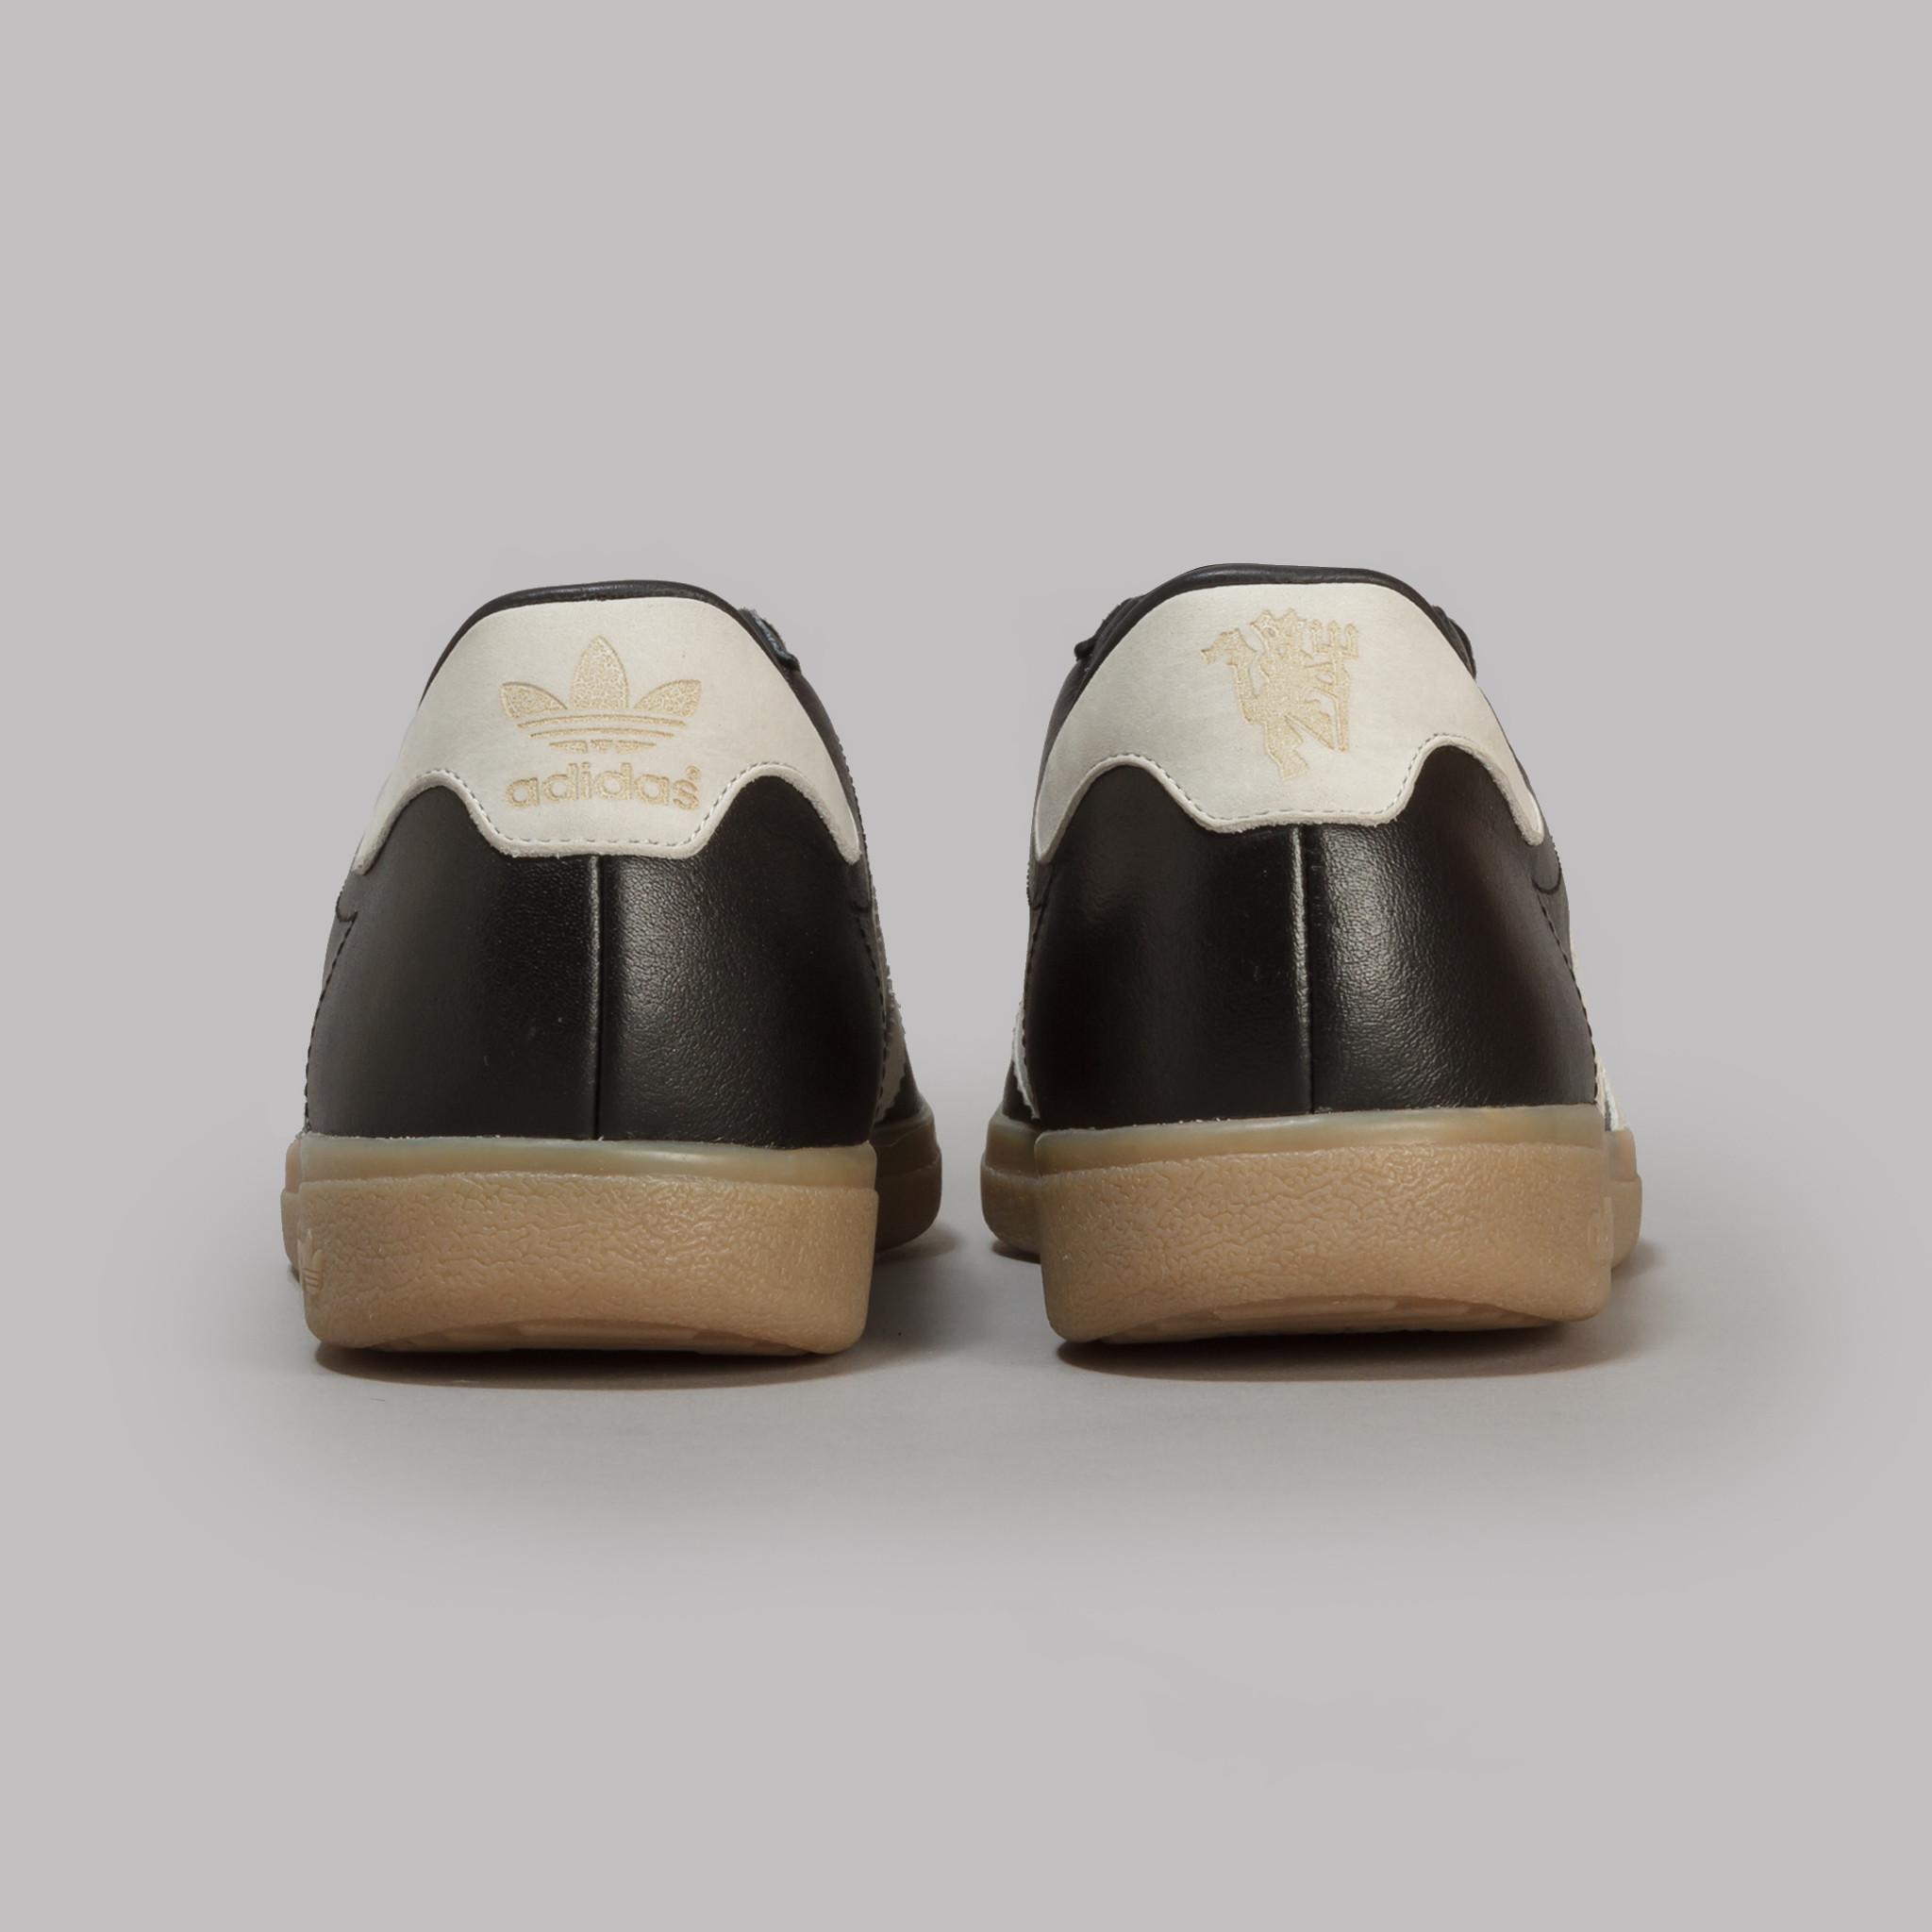 adidas-ashington-191016-01-03